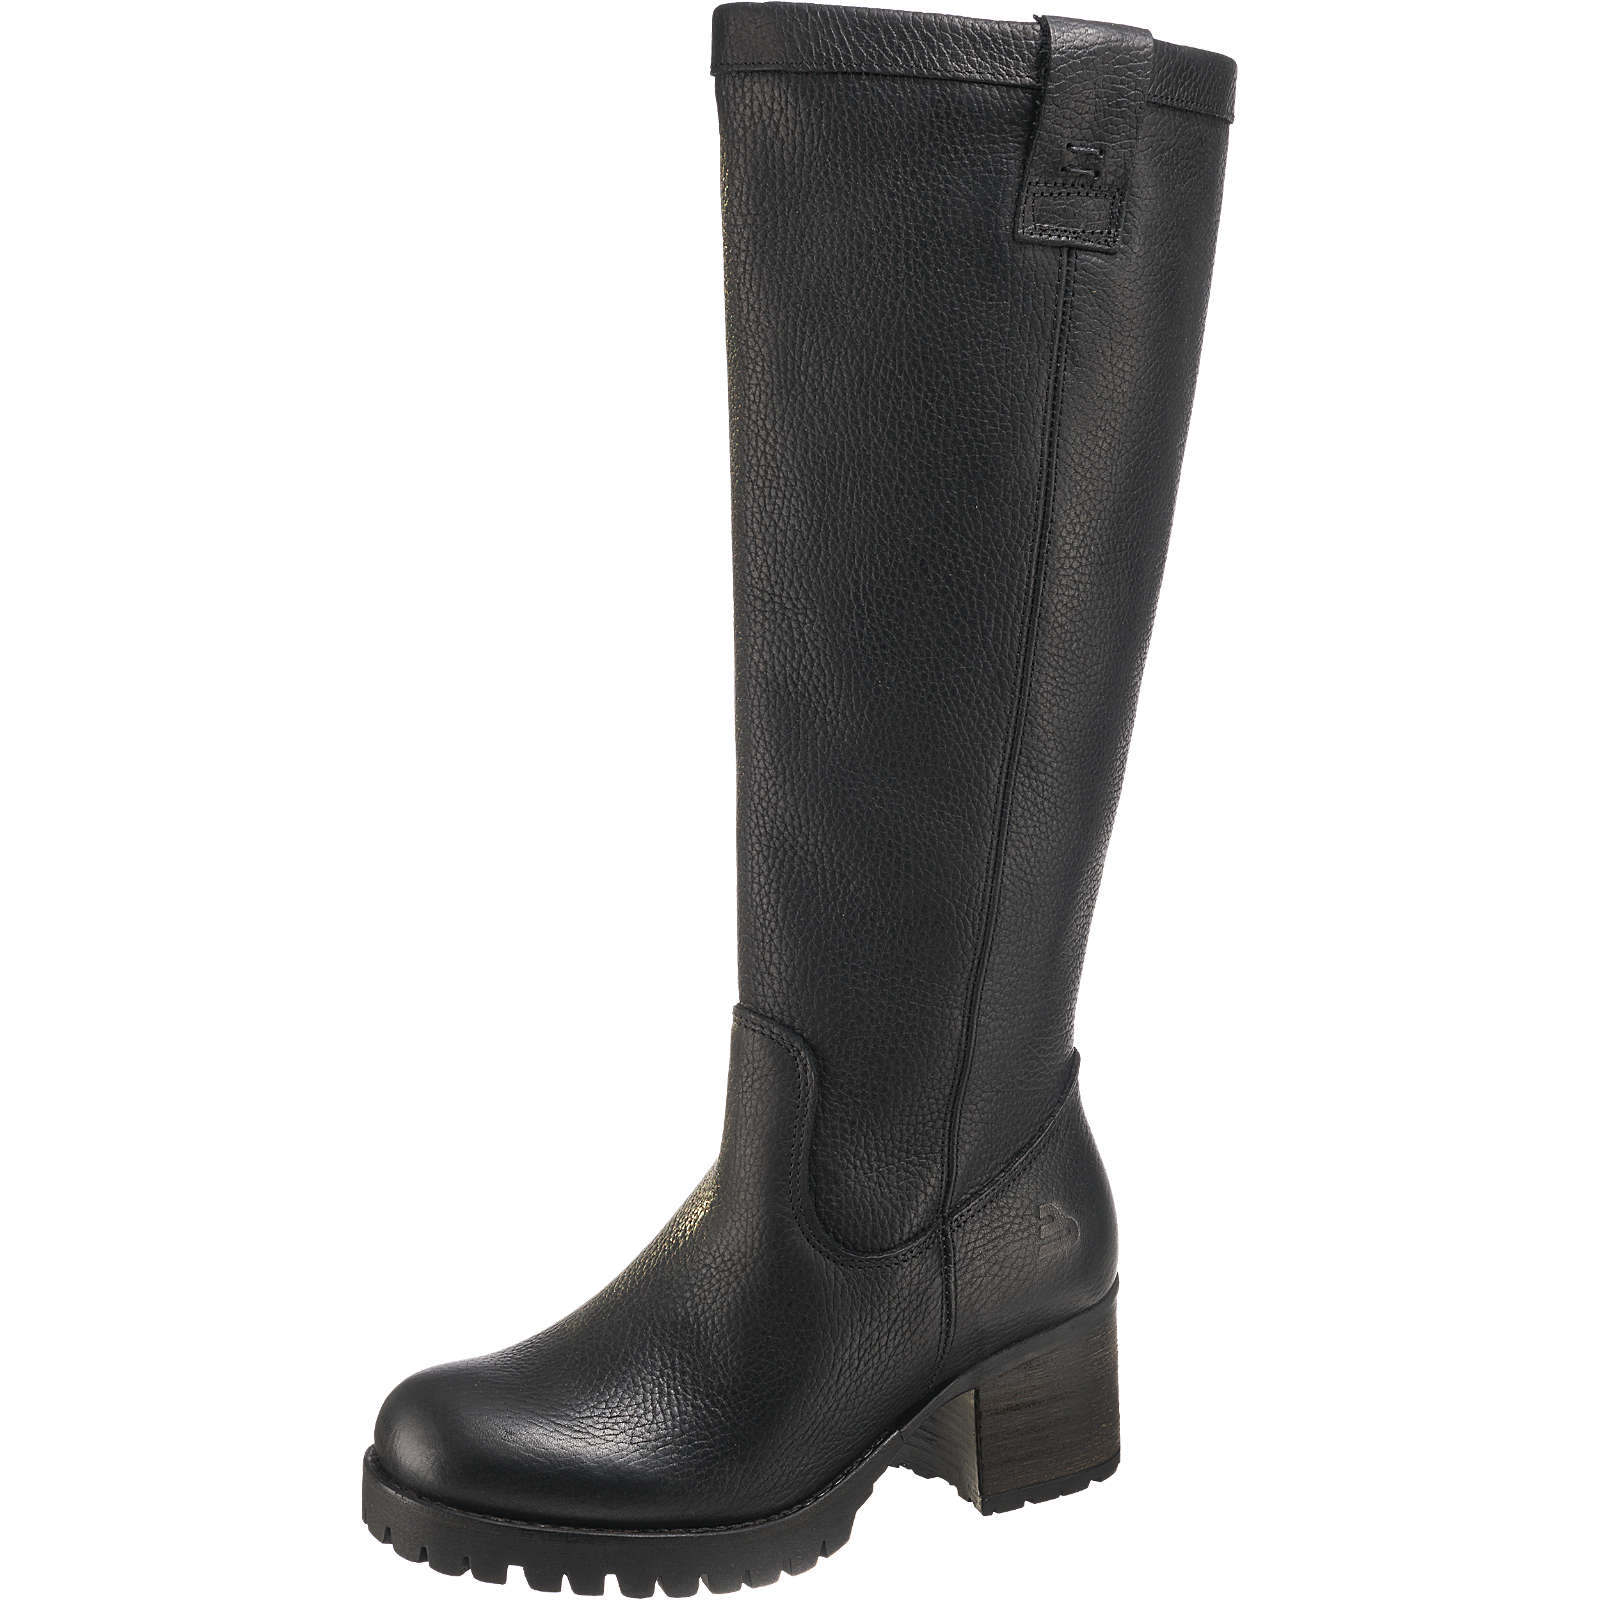 BULLBOXER Klassische Stiefel schwarz Damen Gr. 36